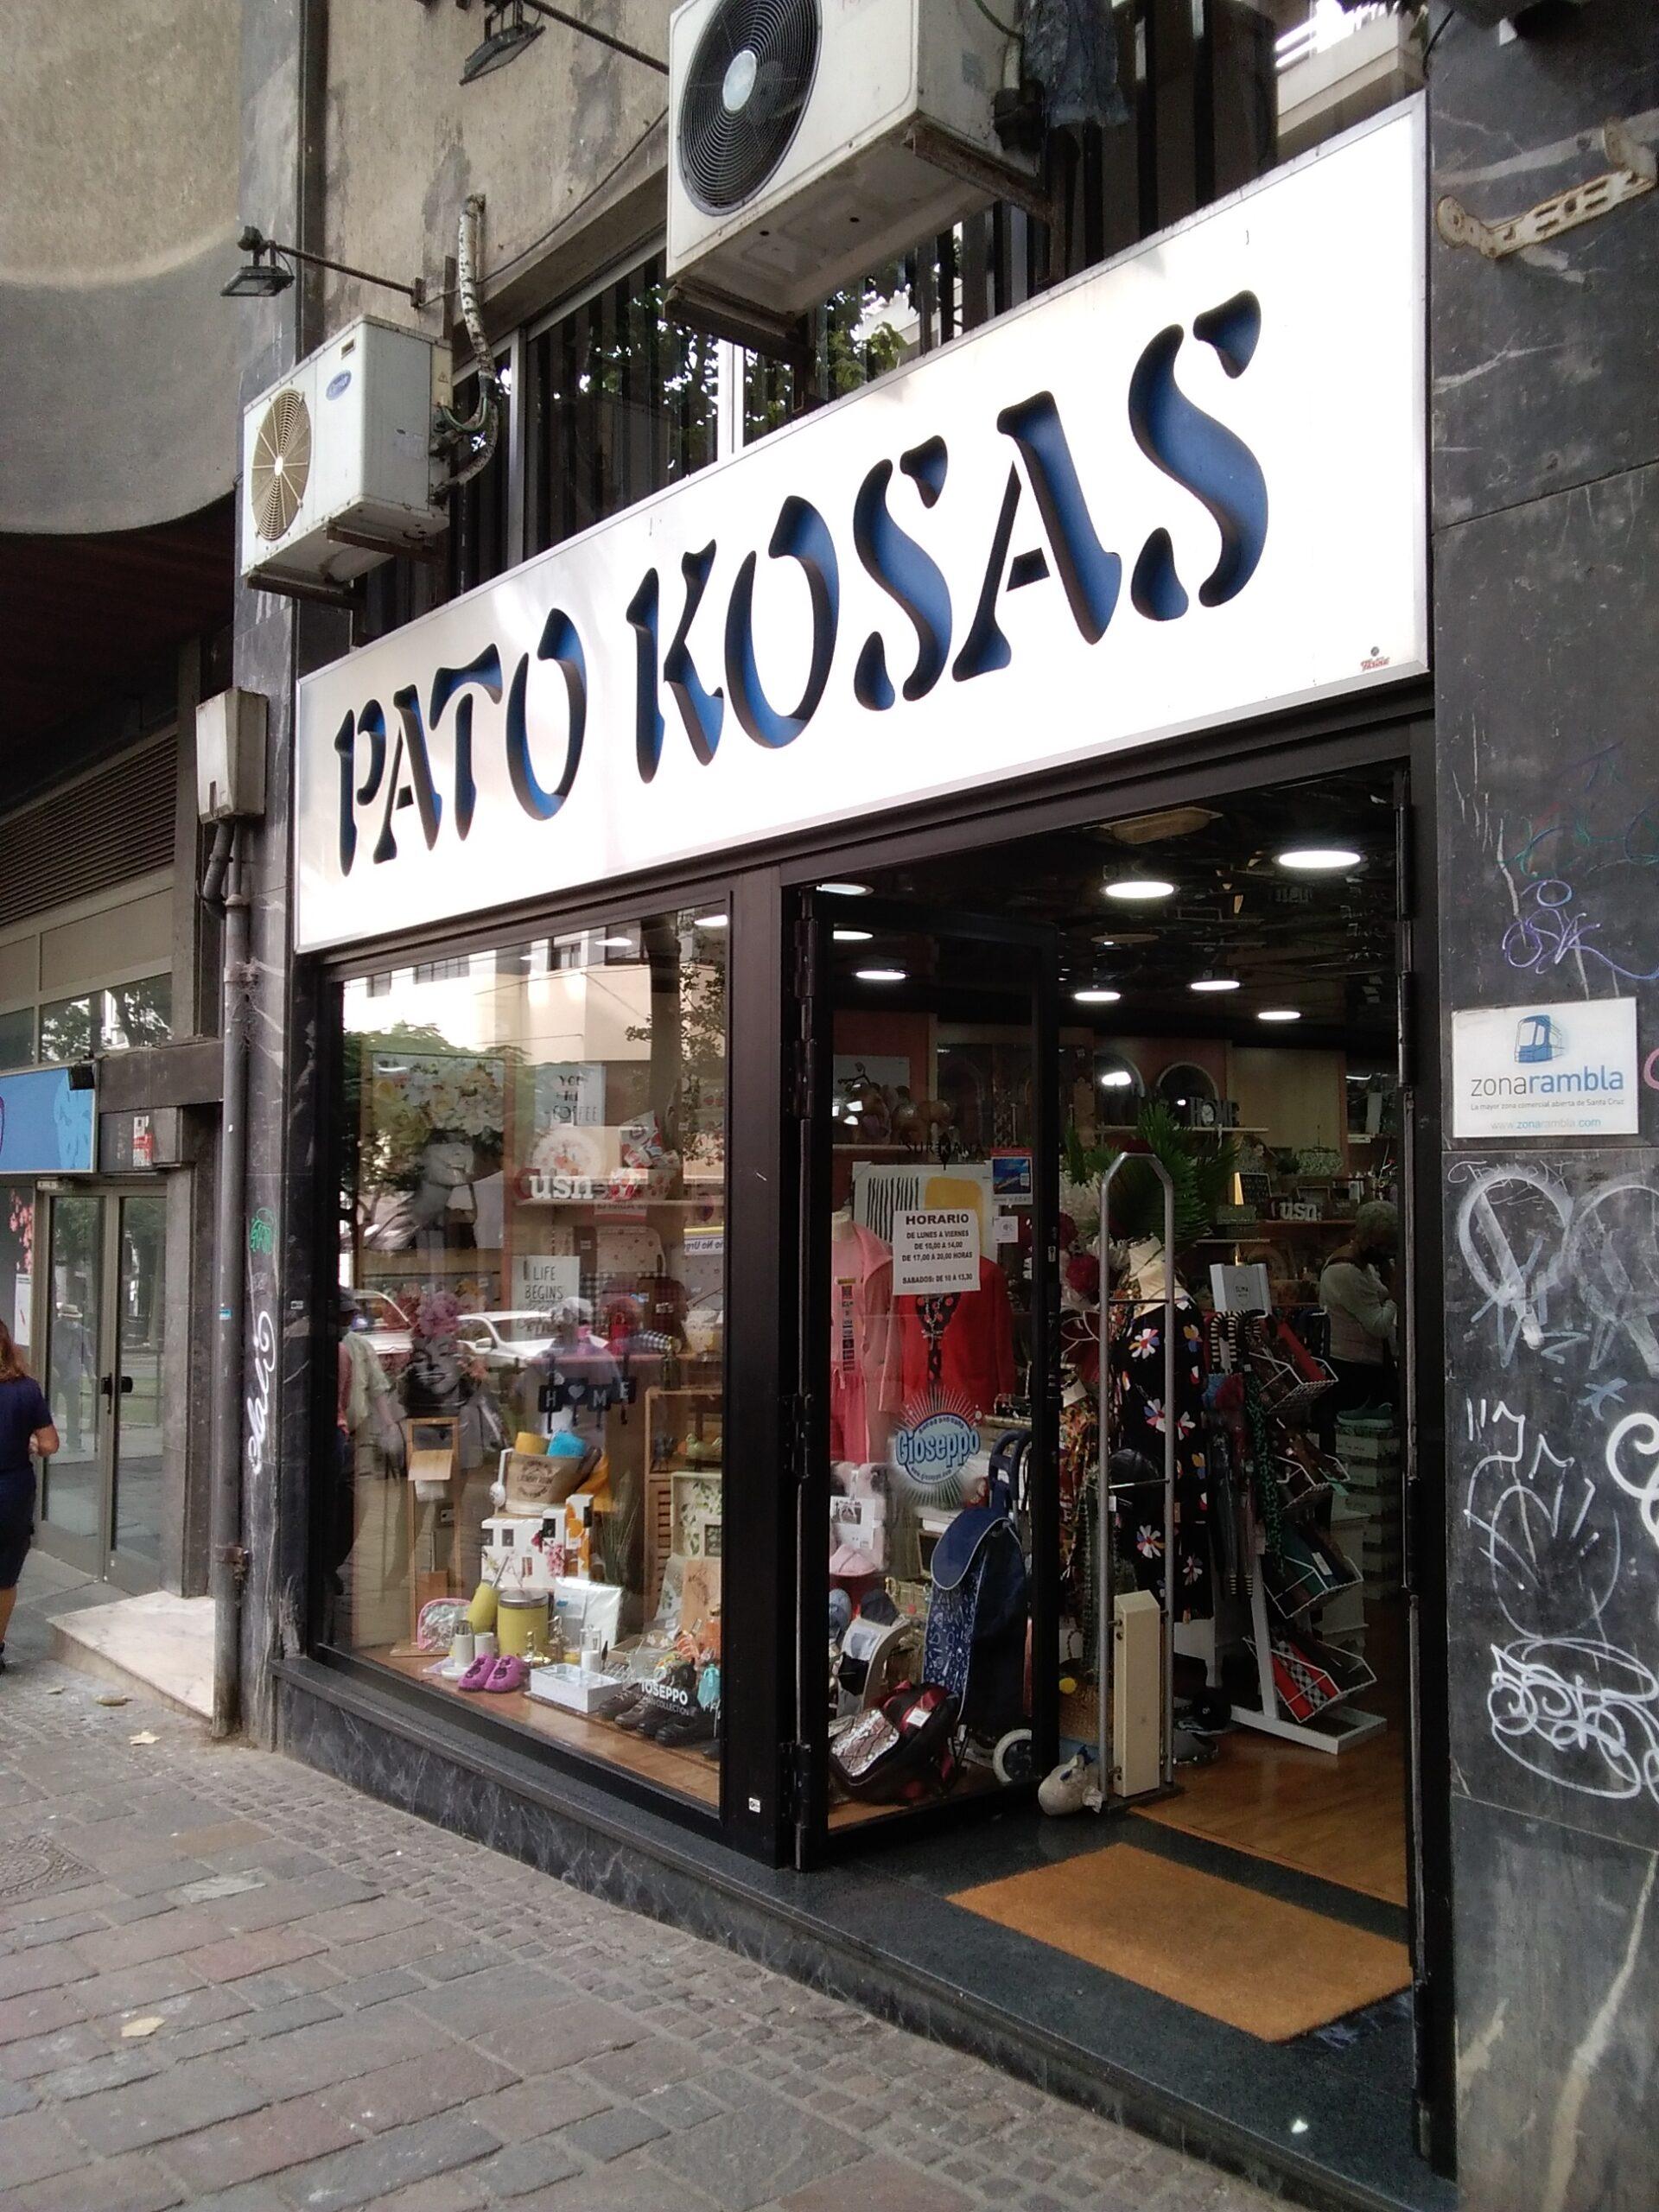 Pato Kosas